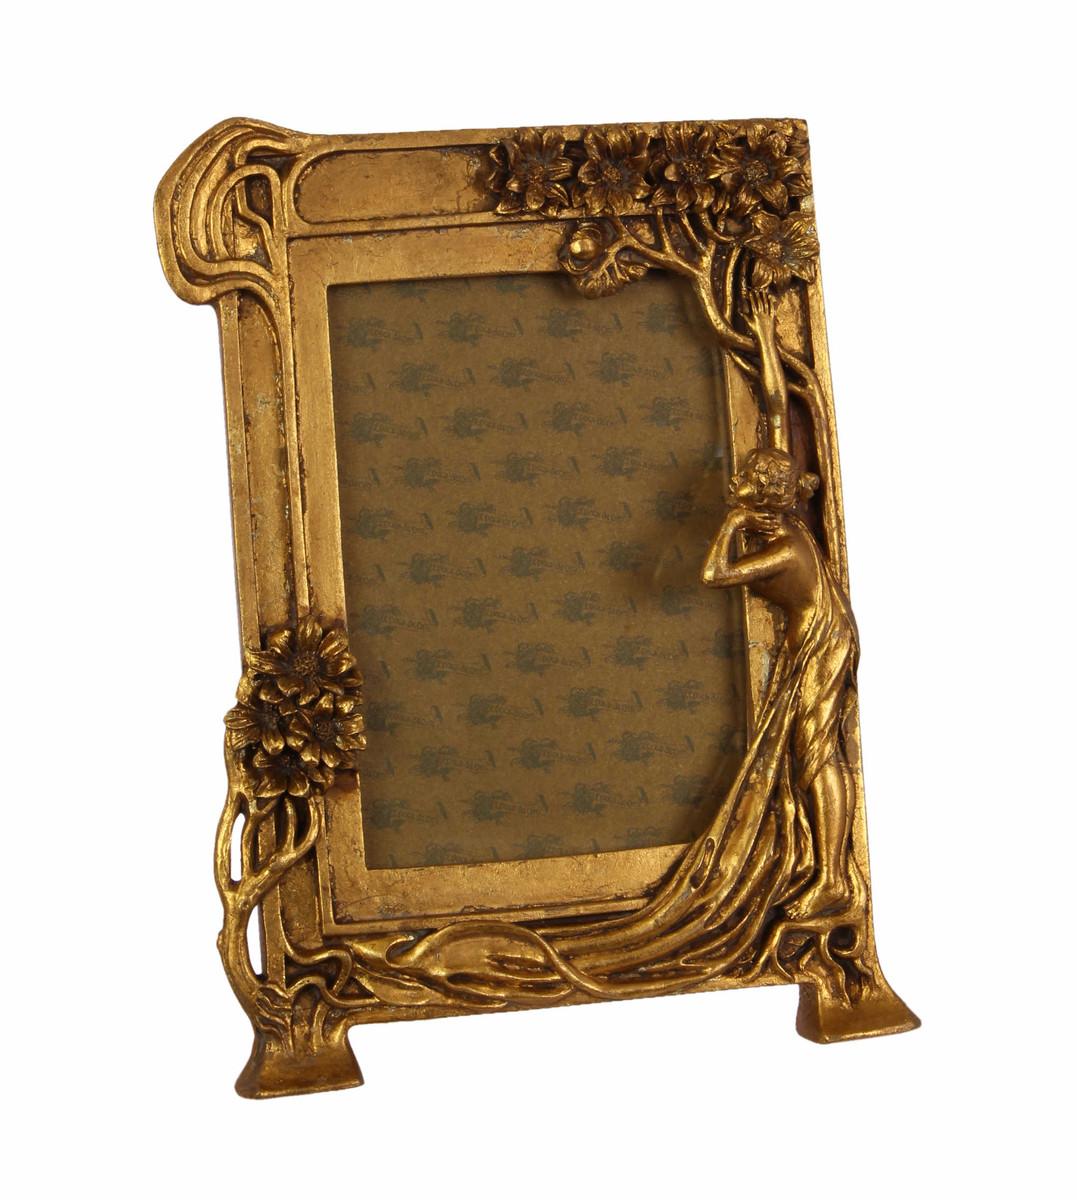 Casa Padrino Jugendstil Bilderrahmen Gold Antik Stil 18.9 x 25.4 cm ...